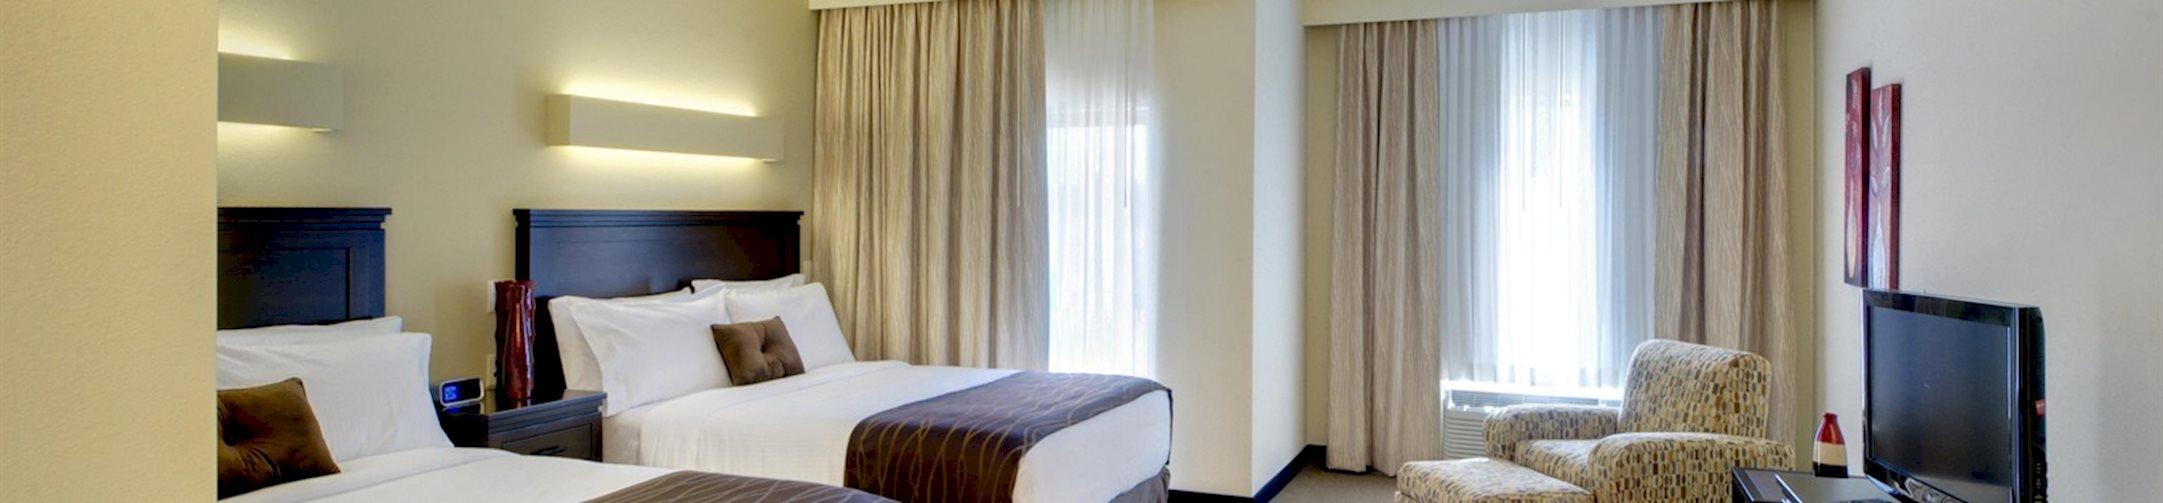 comfort comforter gallery vincennes portfolio choice design ohio suites furnishings berlin hospitality